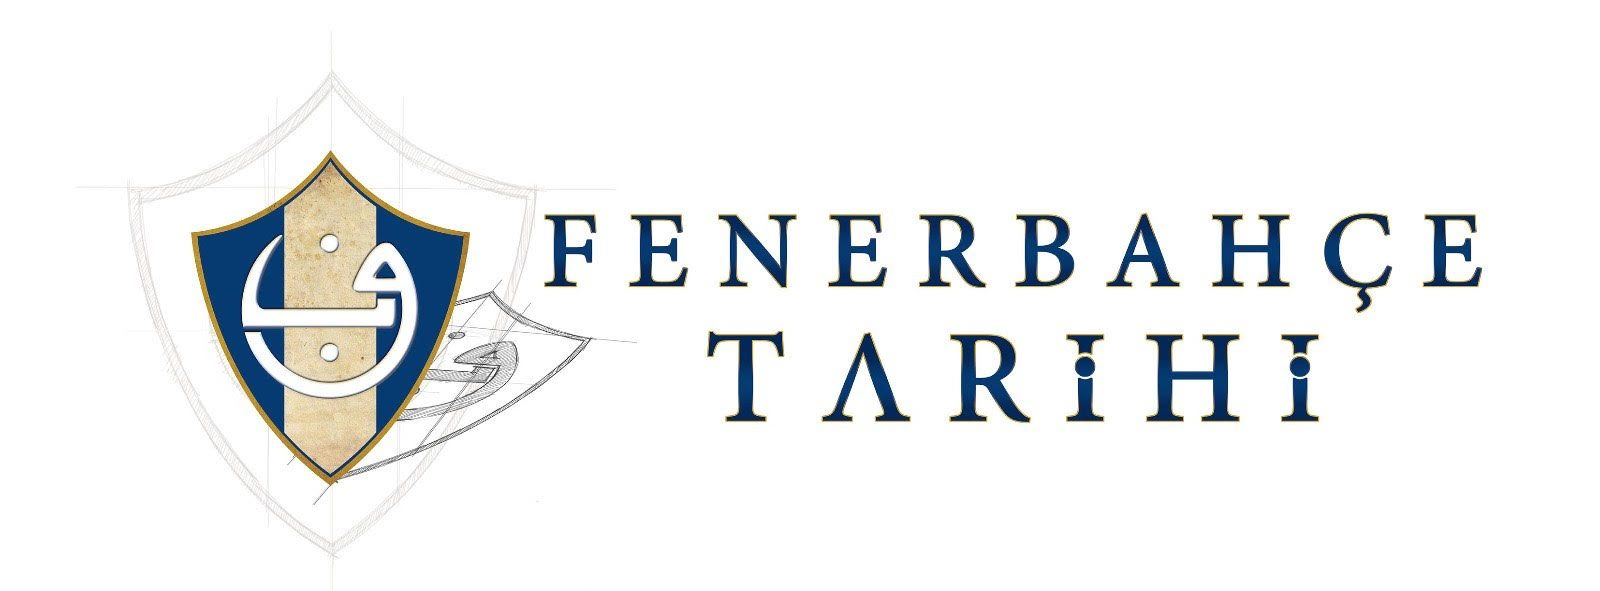 FenerbahceTarihi.org